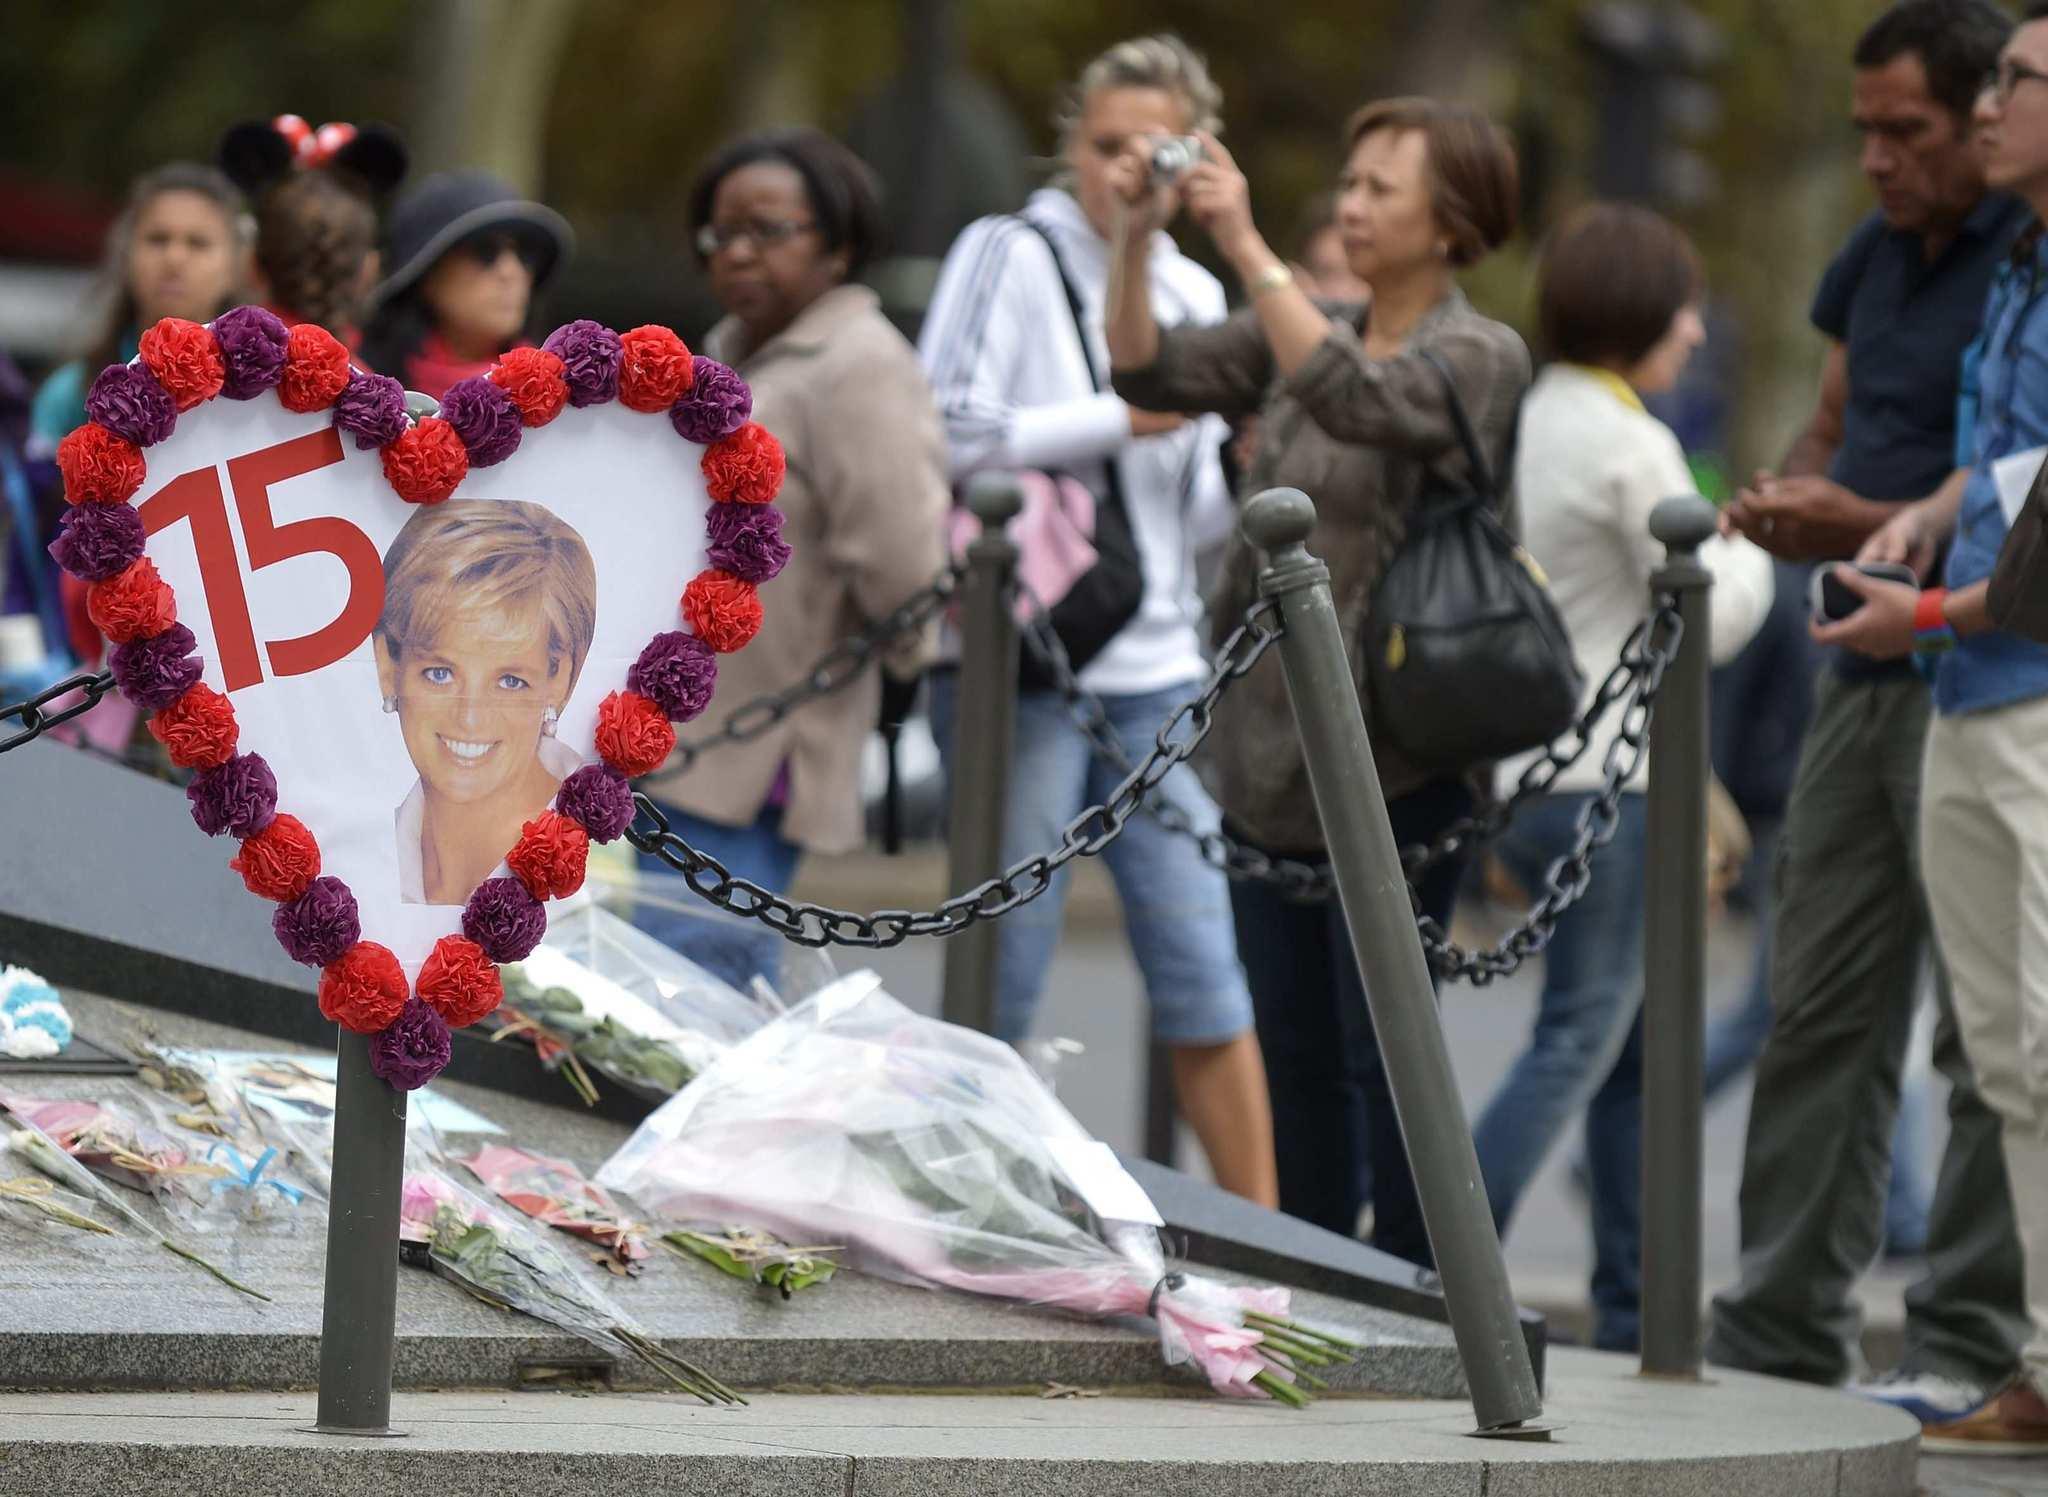 15th anniversary of Princess Diana's death - LA Times